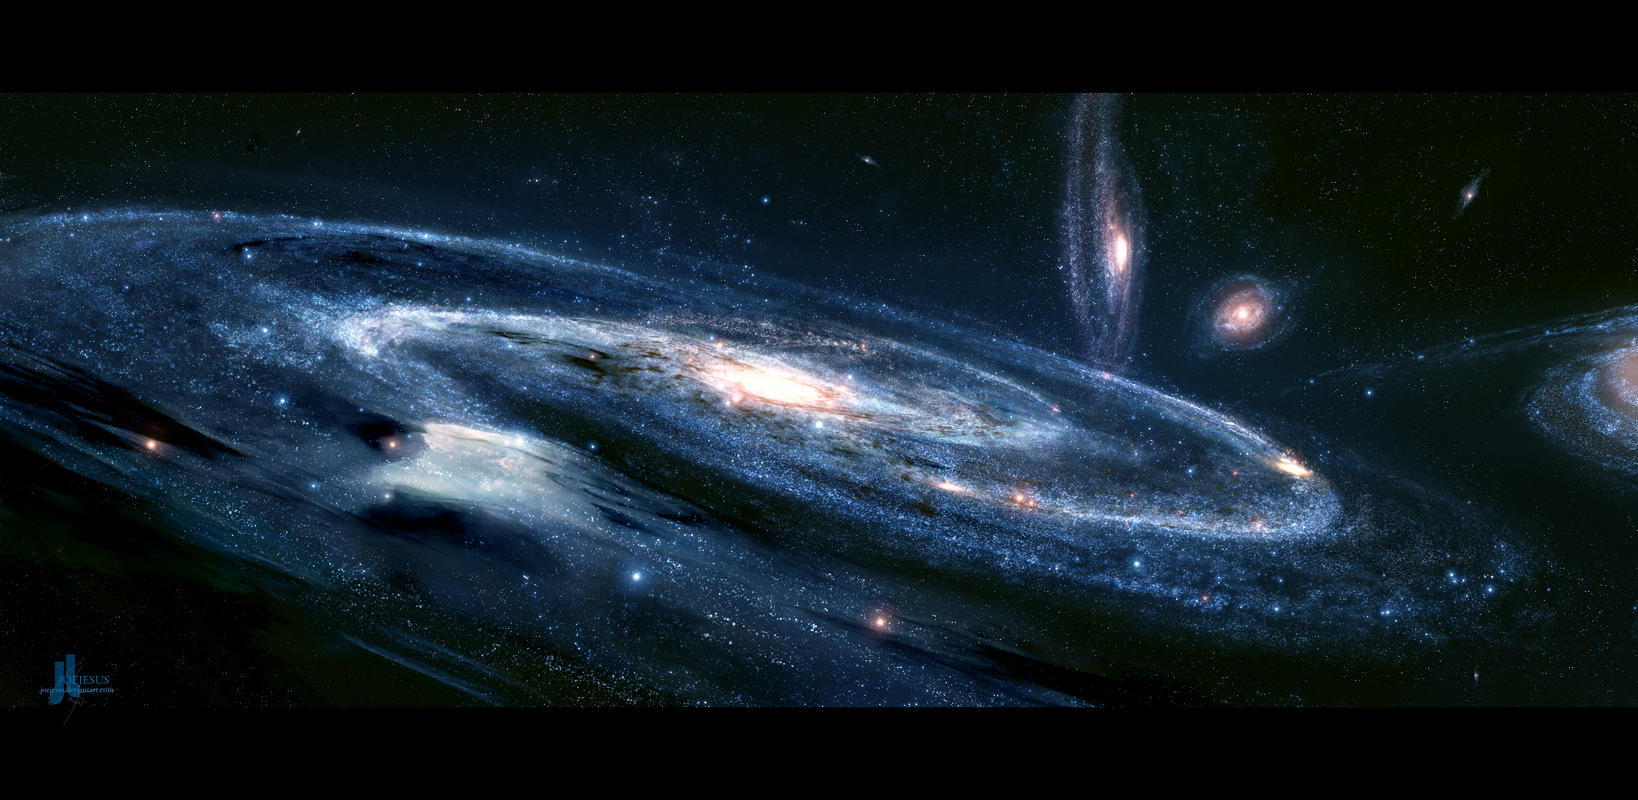 Gears of Existence by JoeyJazz